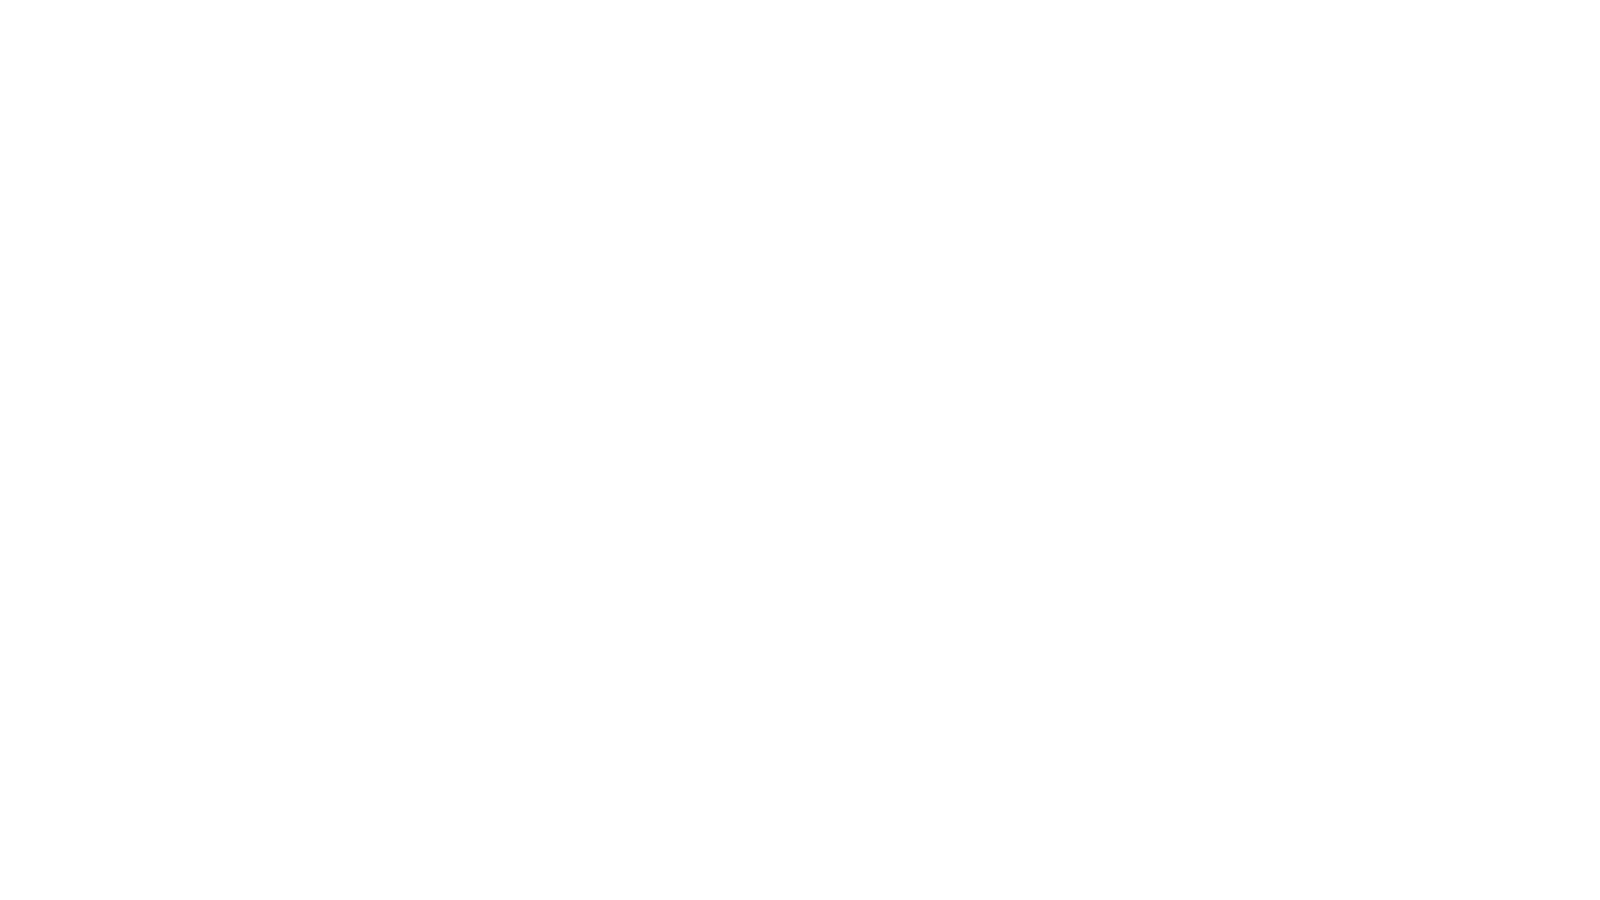 seffleundpferdle